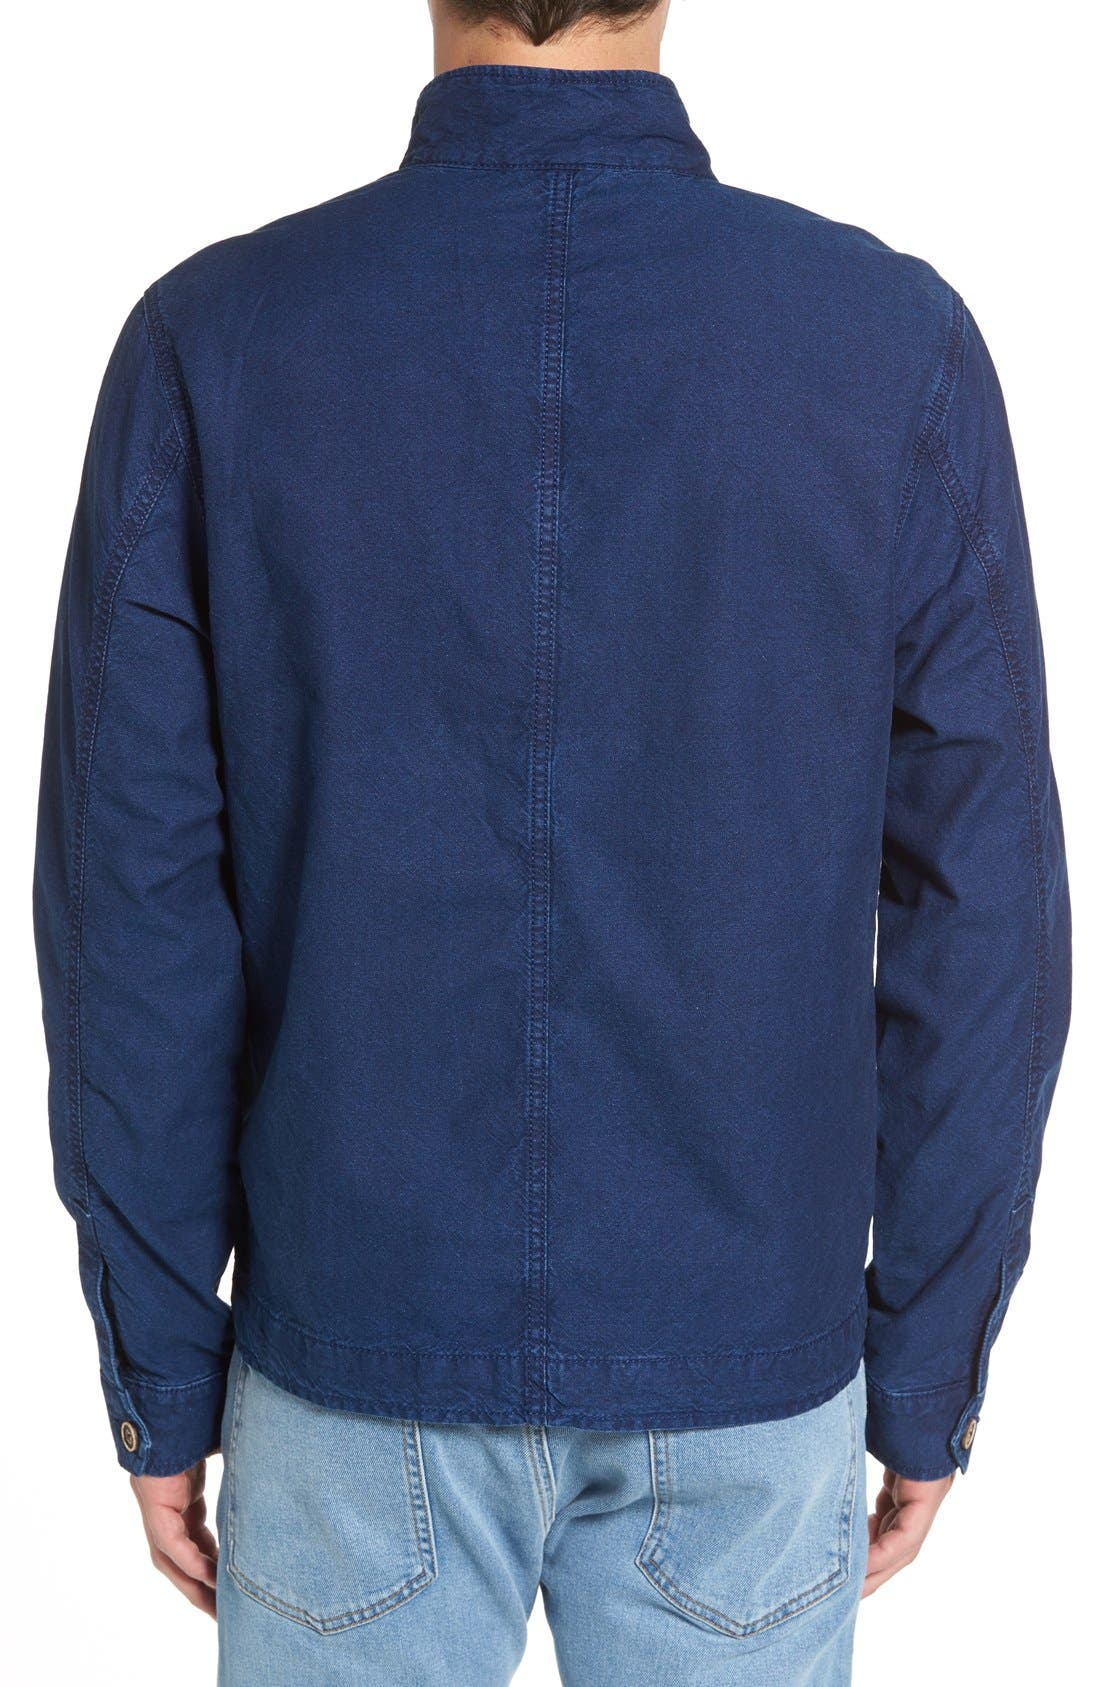 LUCKY BRAND,                             Denim Harrington Jacket,                             Alternate thumbnail 5, color,                             410